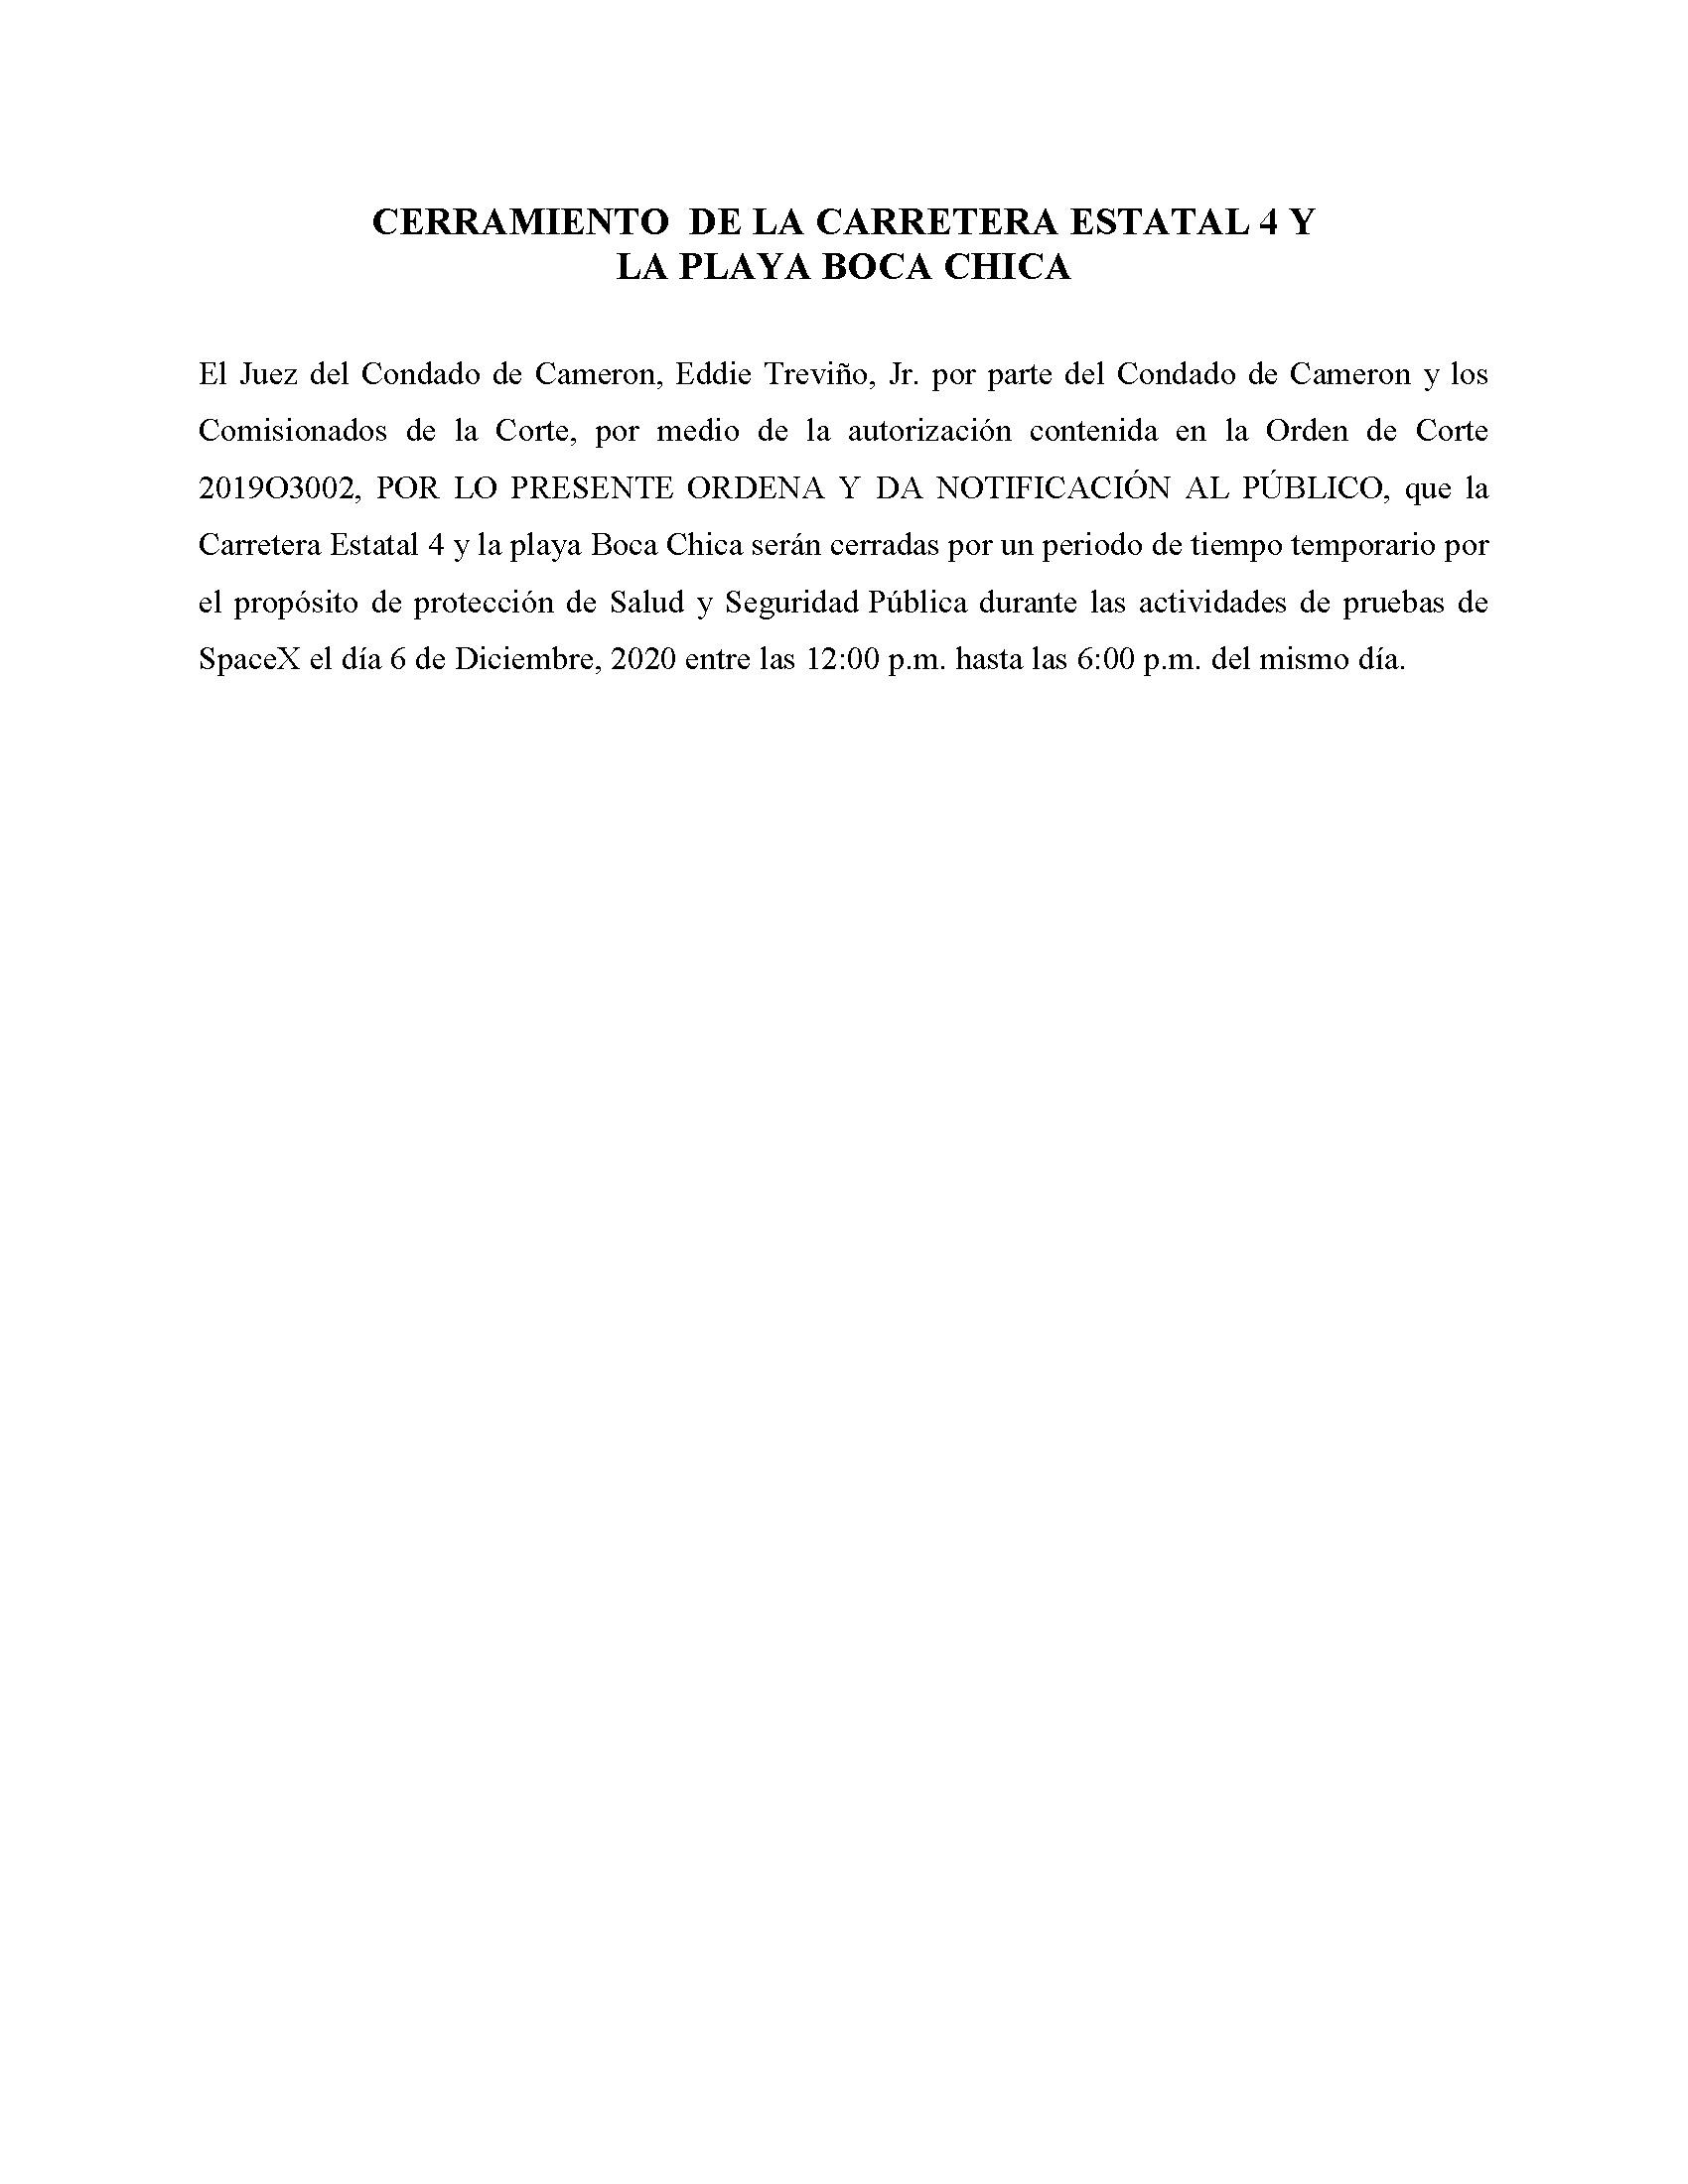 ORDER.CLOSURE OF HIGHWAY 4 Y LA PLAYA BOCA CHICA.SPANISH.12.06.20